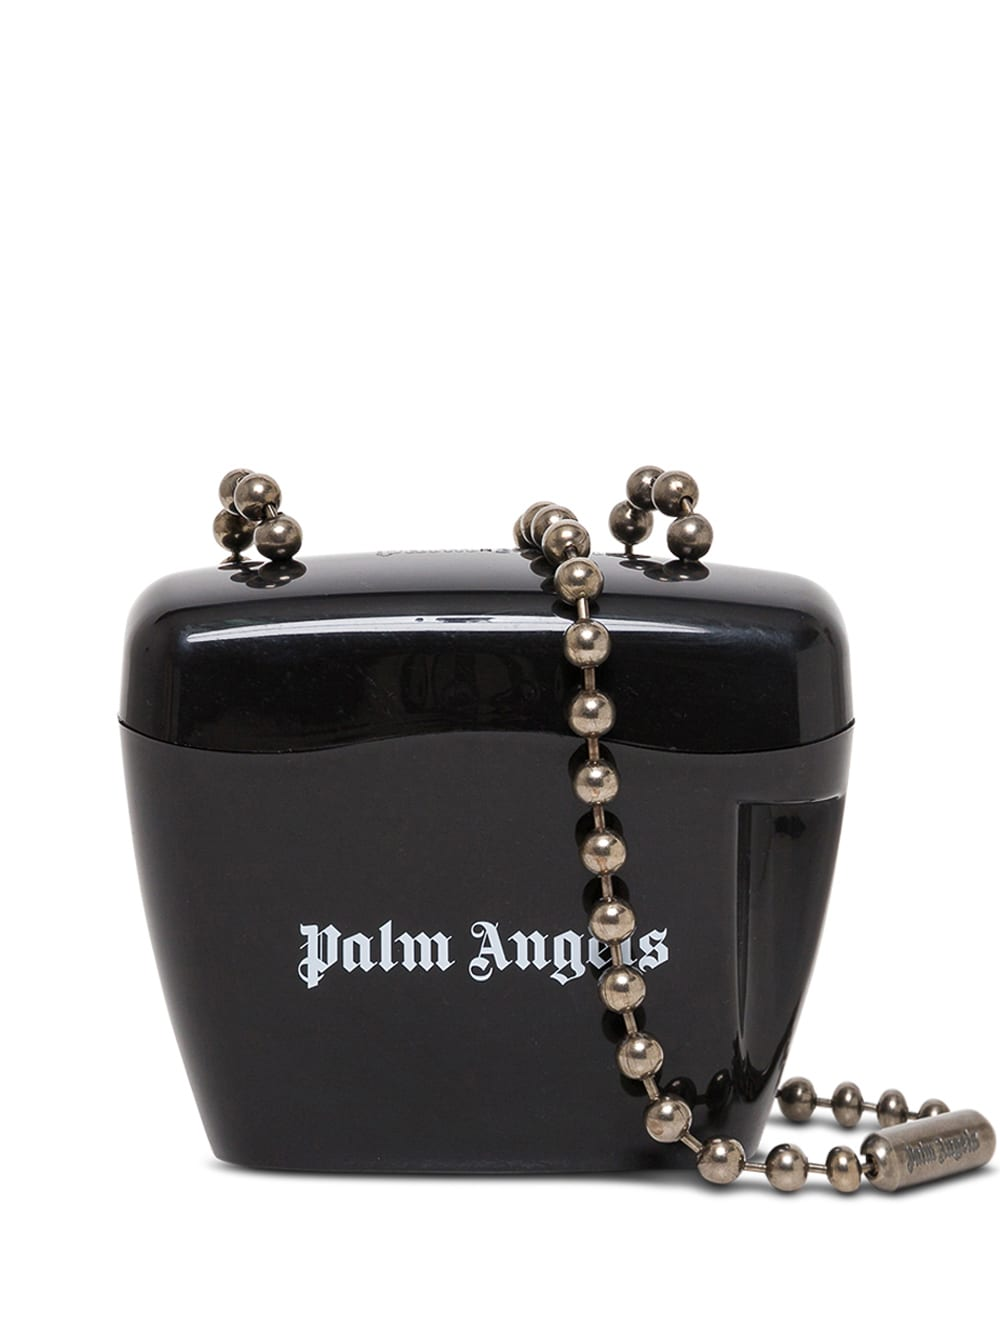 Palm Angels Mini Padlock Black Crossbody Bag With Logo Print